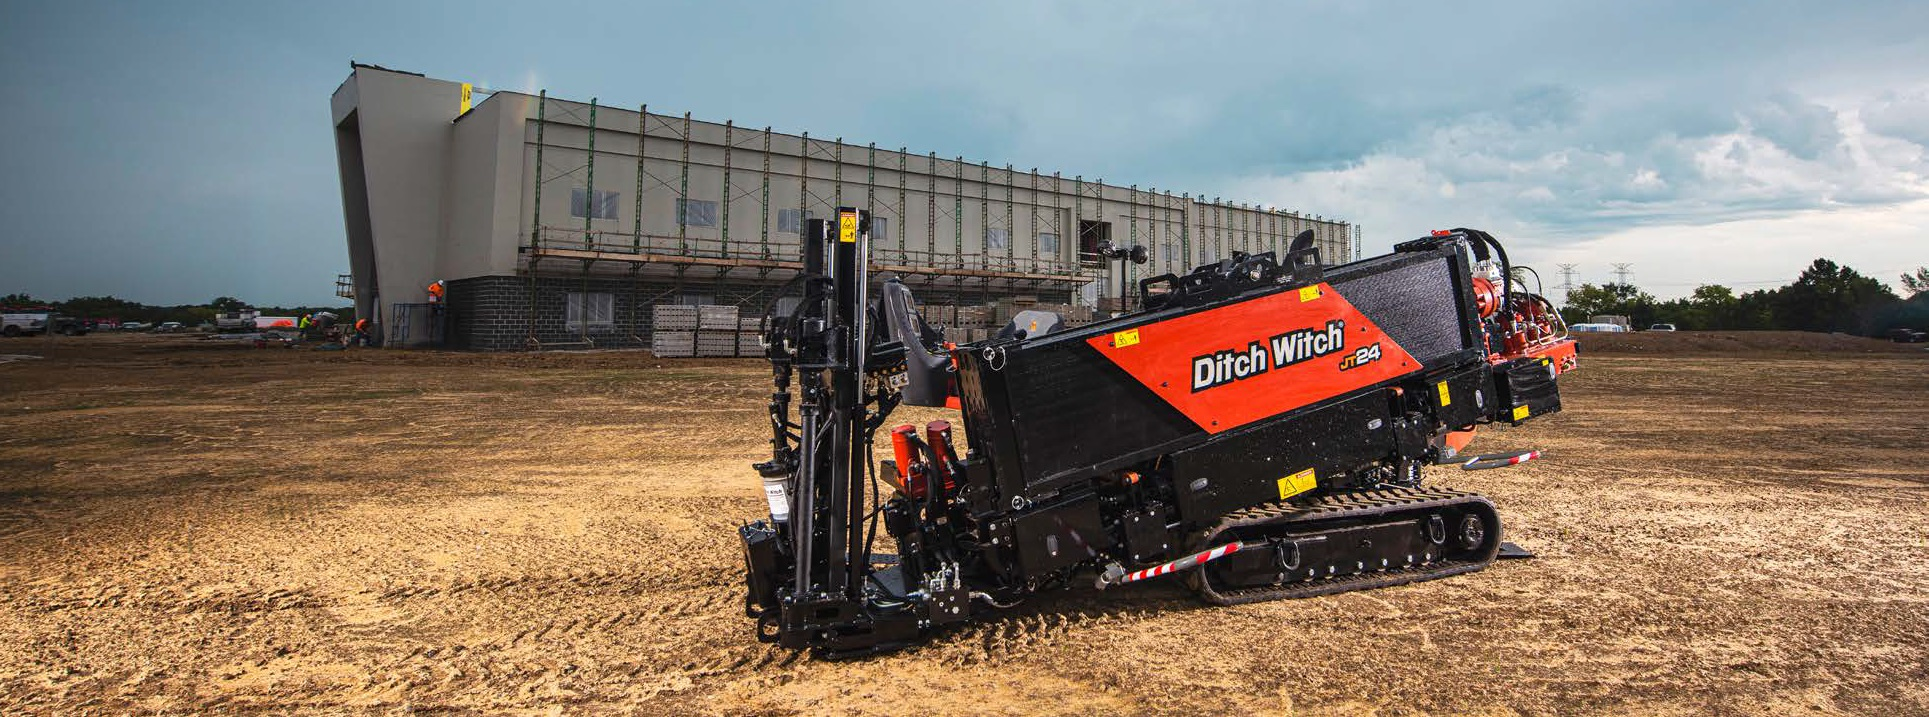 DEFIGO LTD a livrat Ditch Witch JT 24 în România